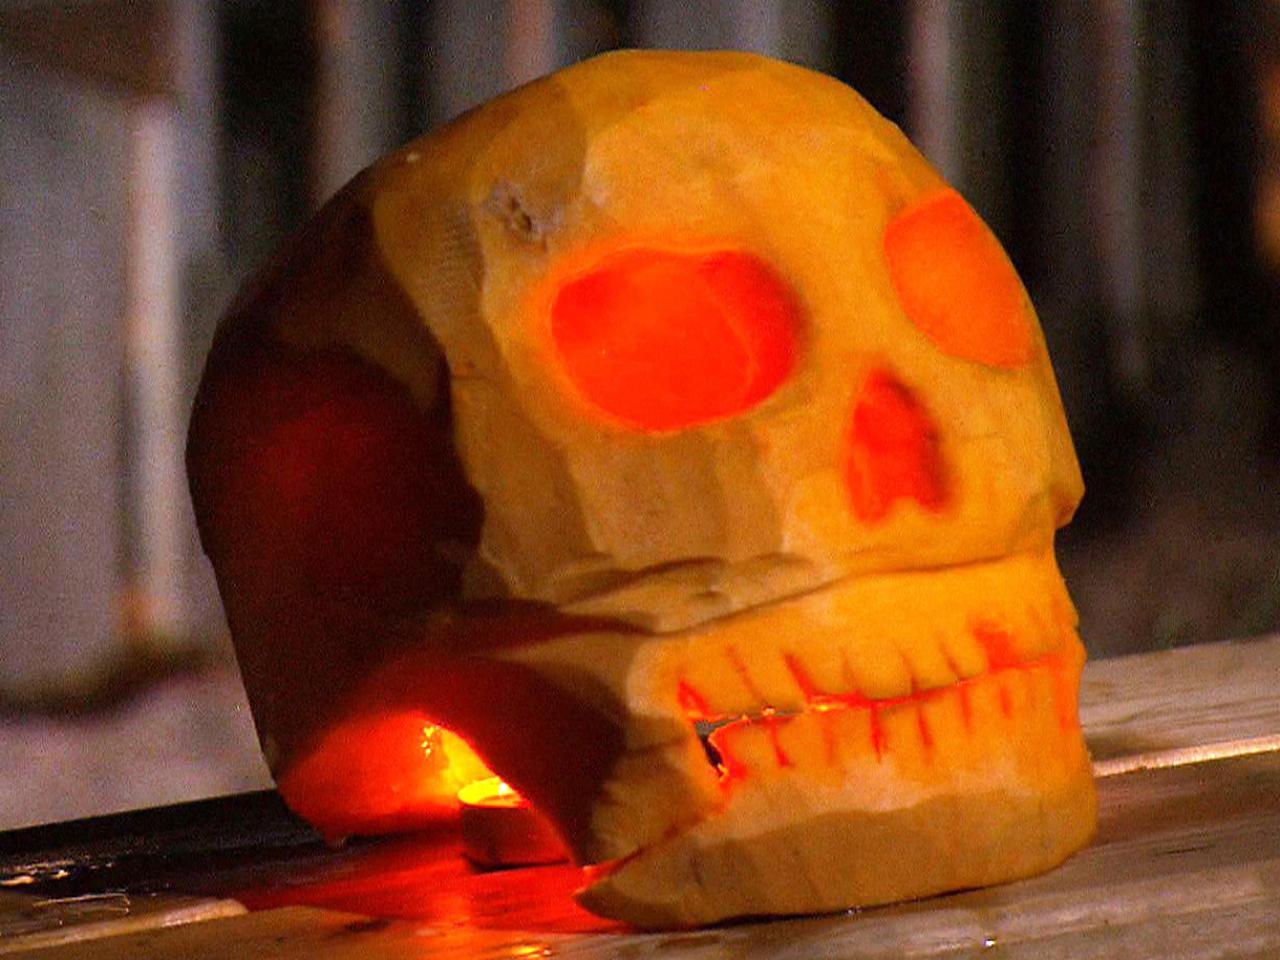 halloween pumpkin carving: skull jack o' lantern | how-tos | diy